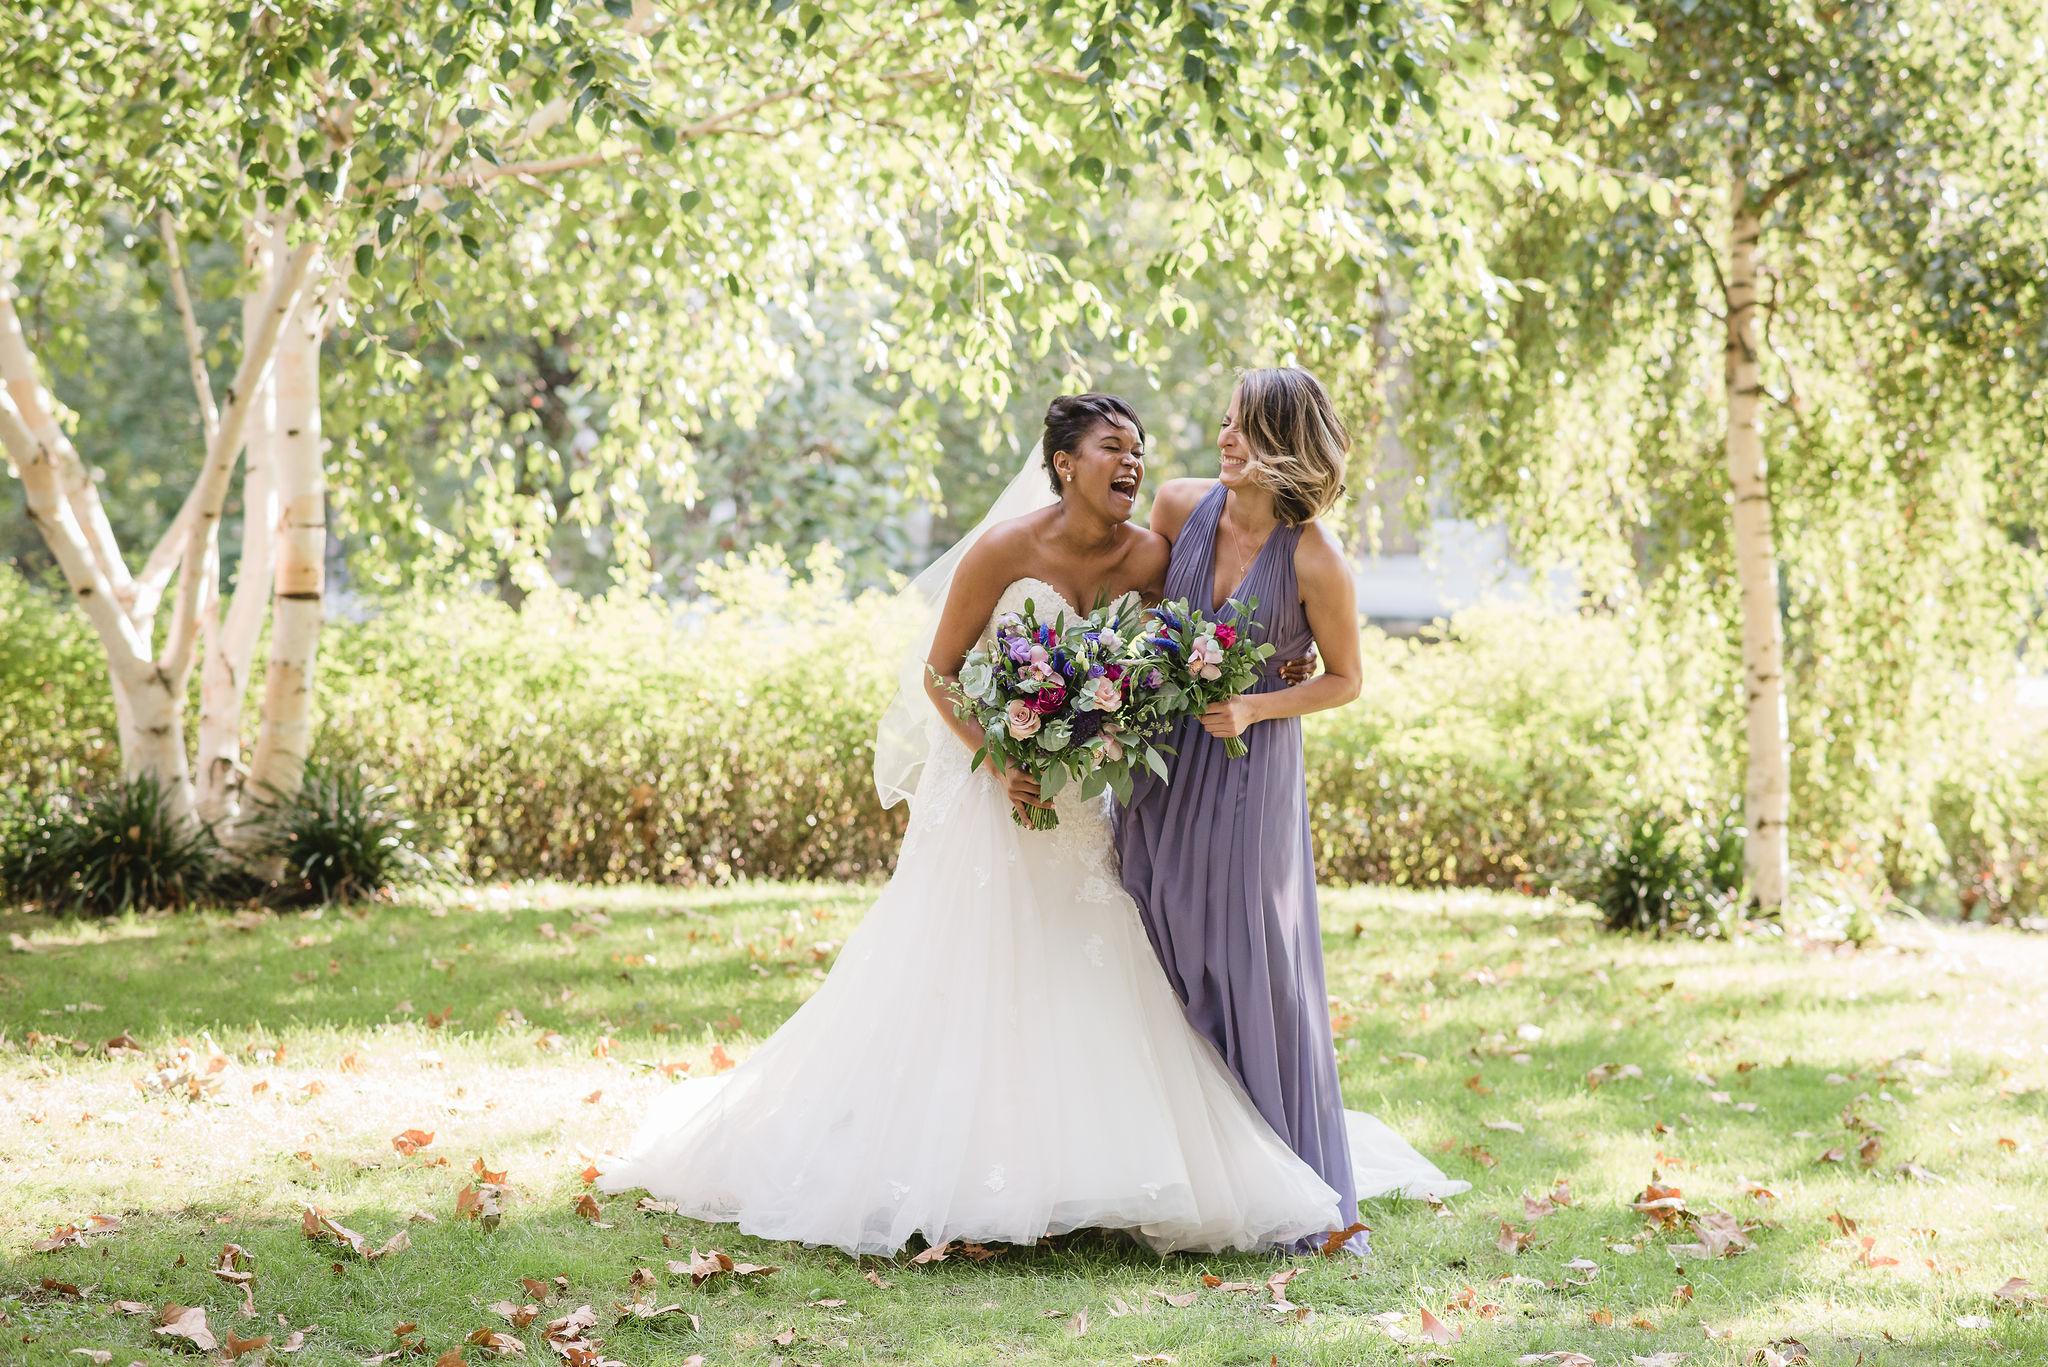 The Anthologist_Drake_and_Morgan_London_Wedding_83.jpg